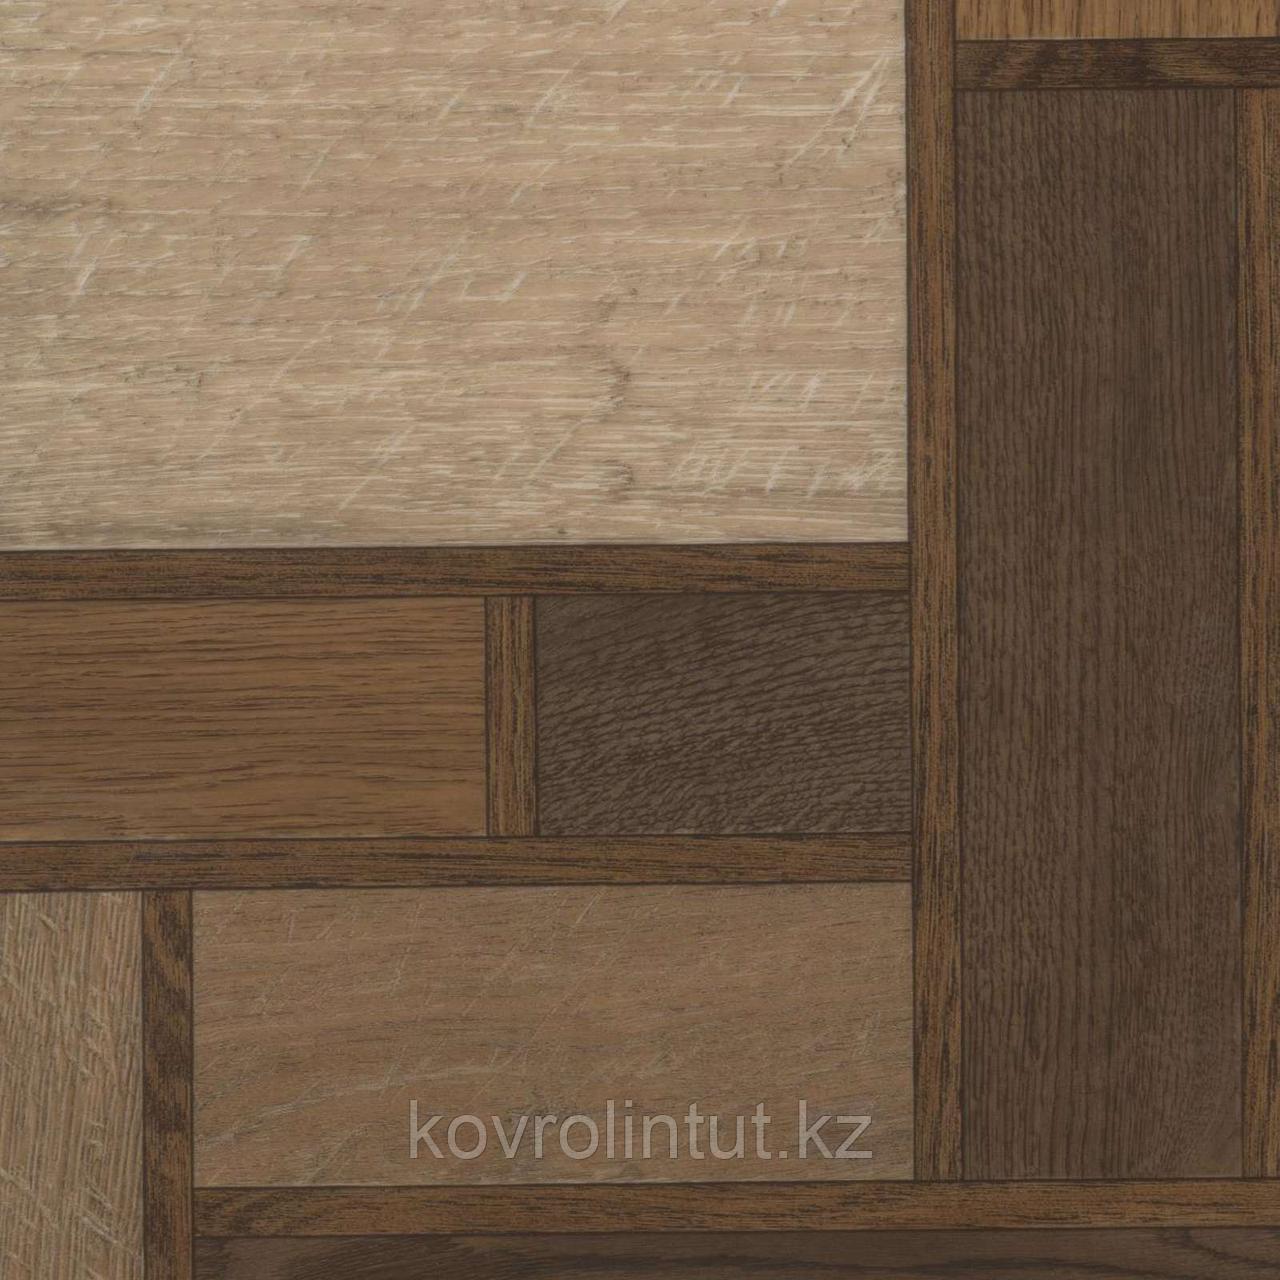 Линолеум Tarkett бытовой Favorit Stobo 1 2,5 м